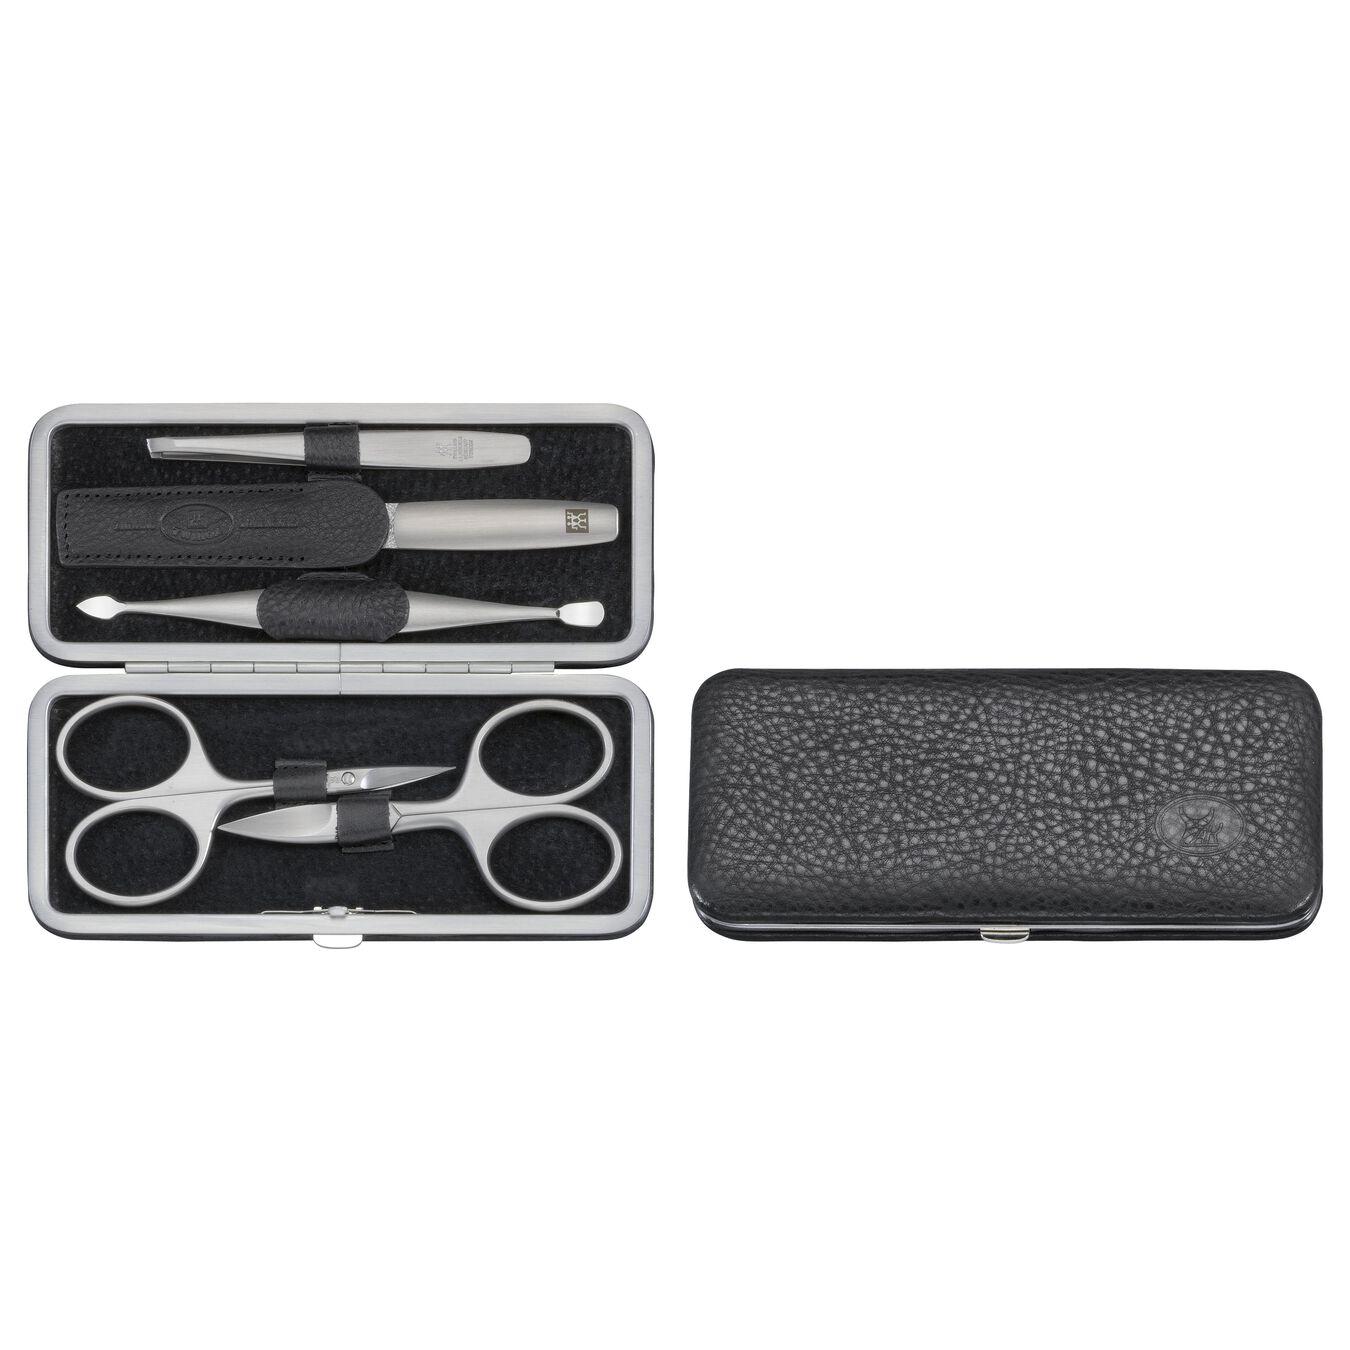 6-pc Manicure set - Black,,large 1